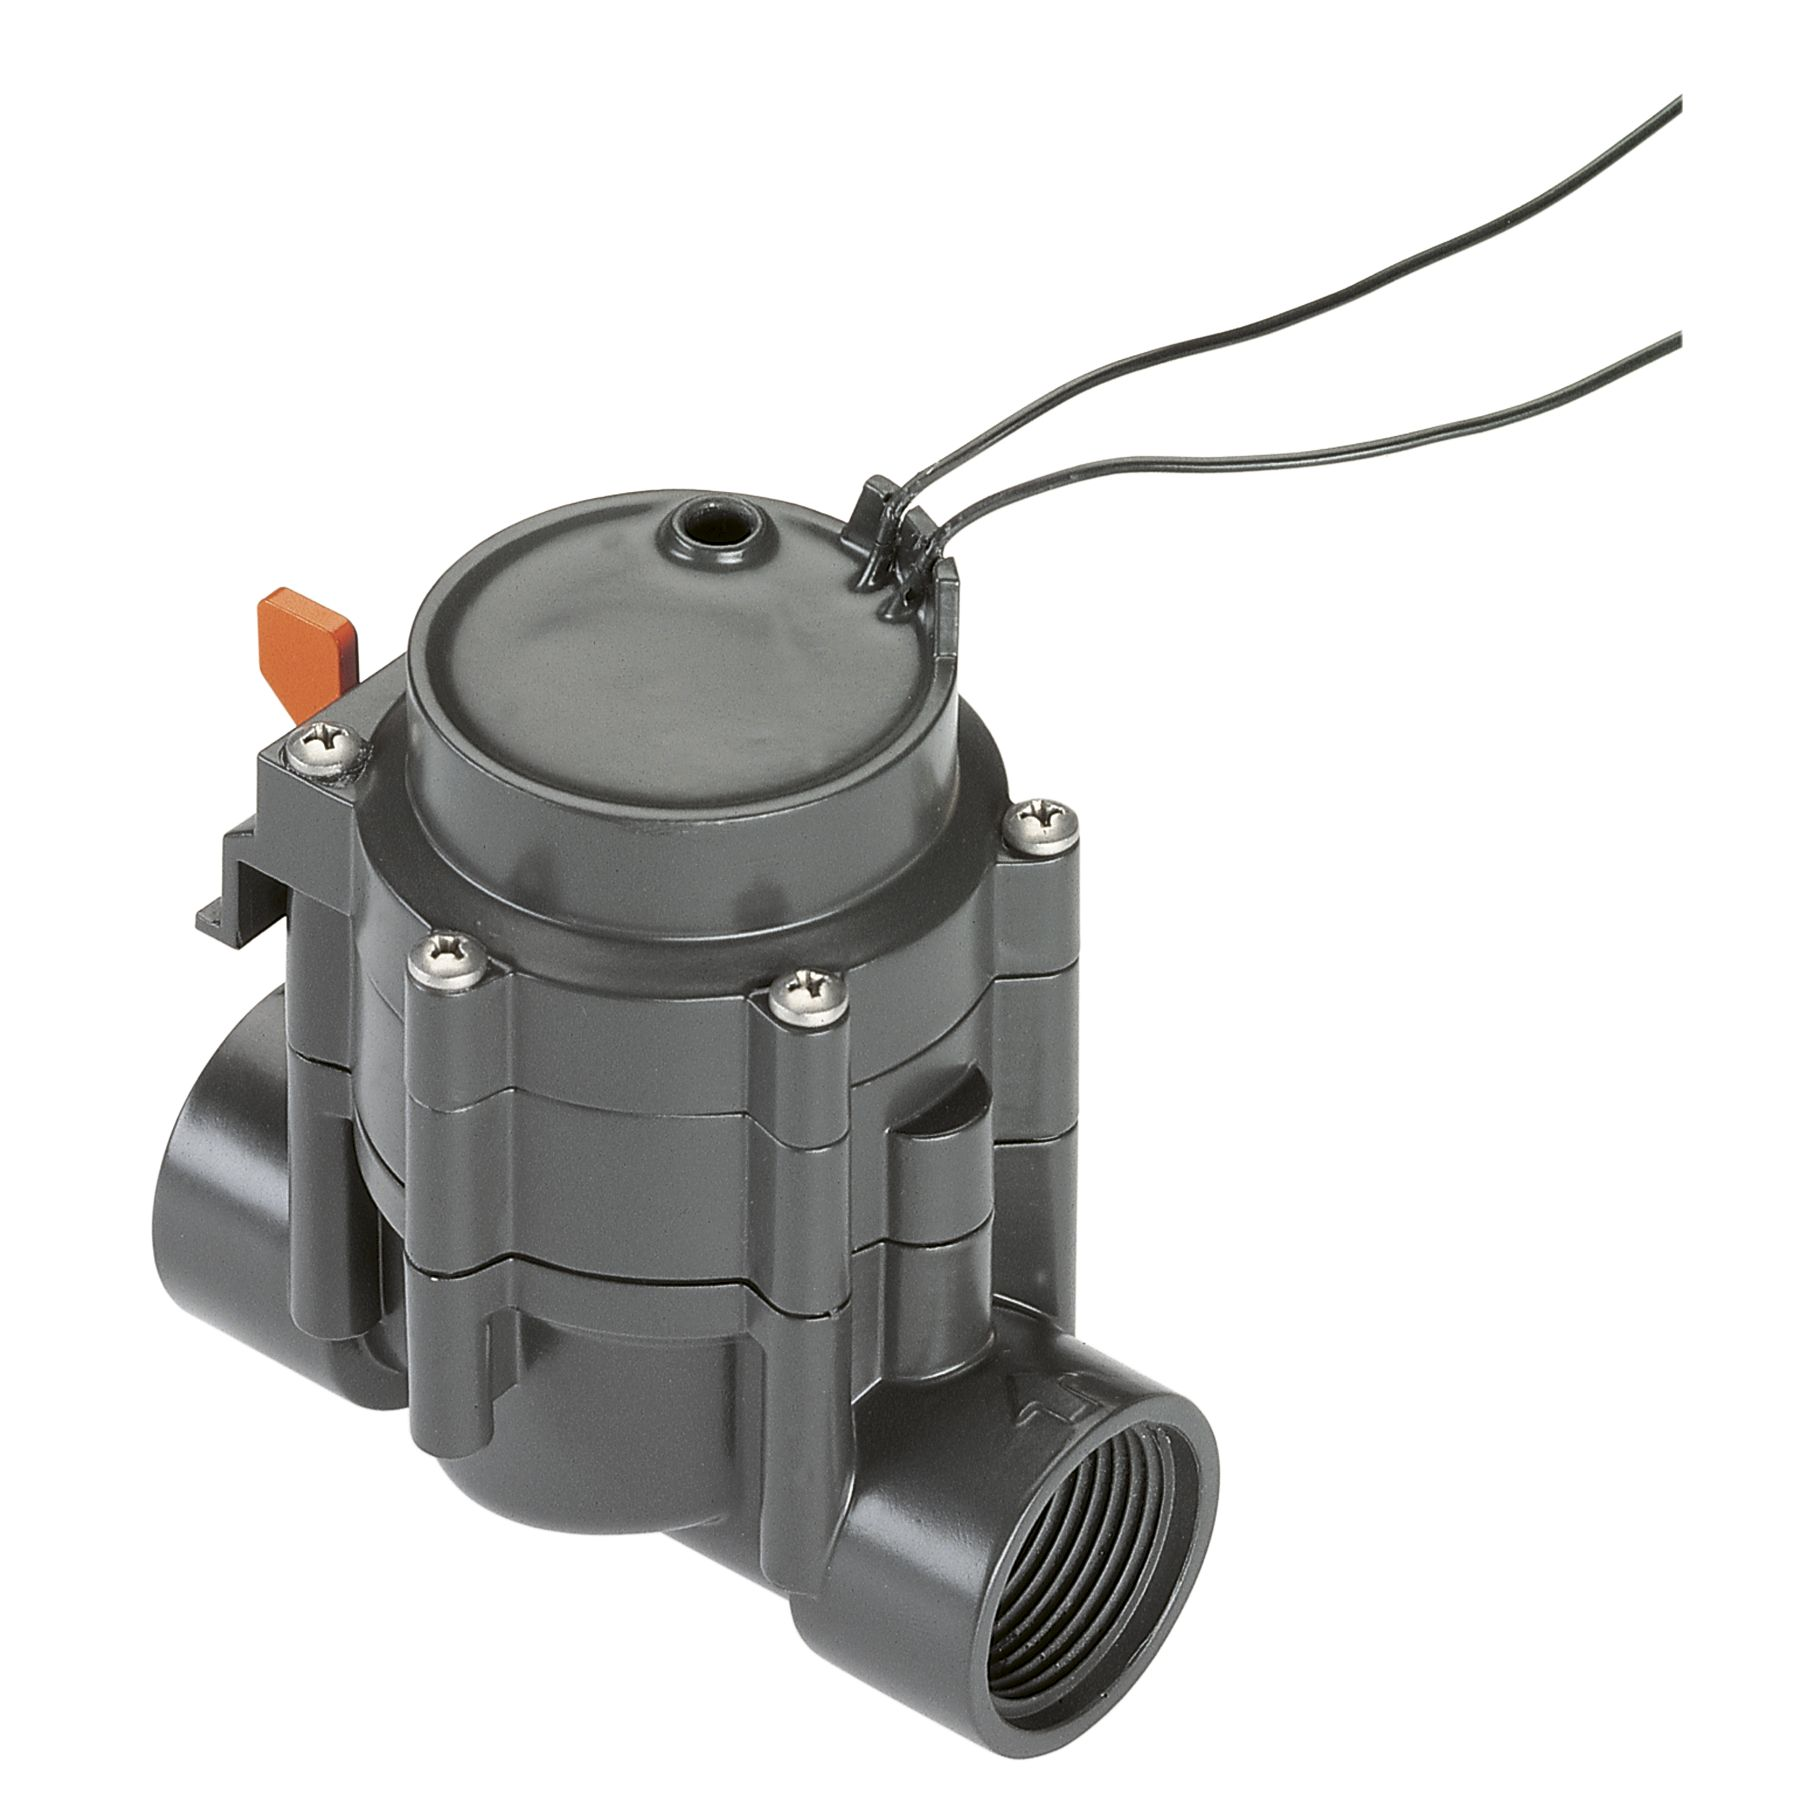 Клапан для полива Gardena 1278 (01278-27.000.00) клапан для полива gardena 1278